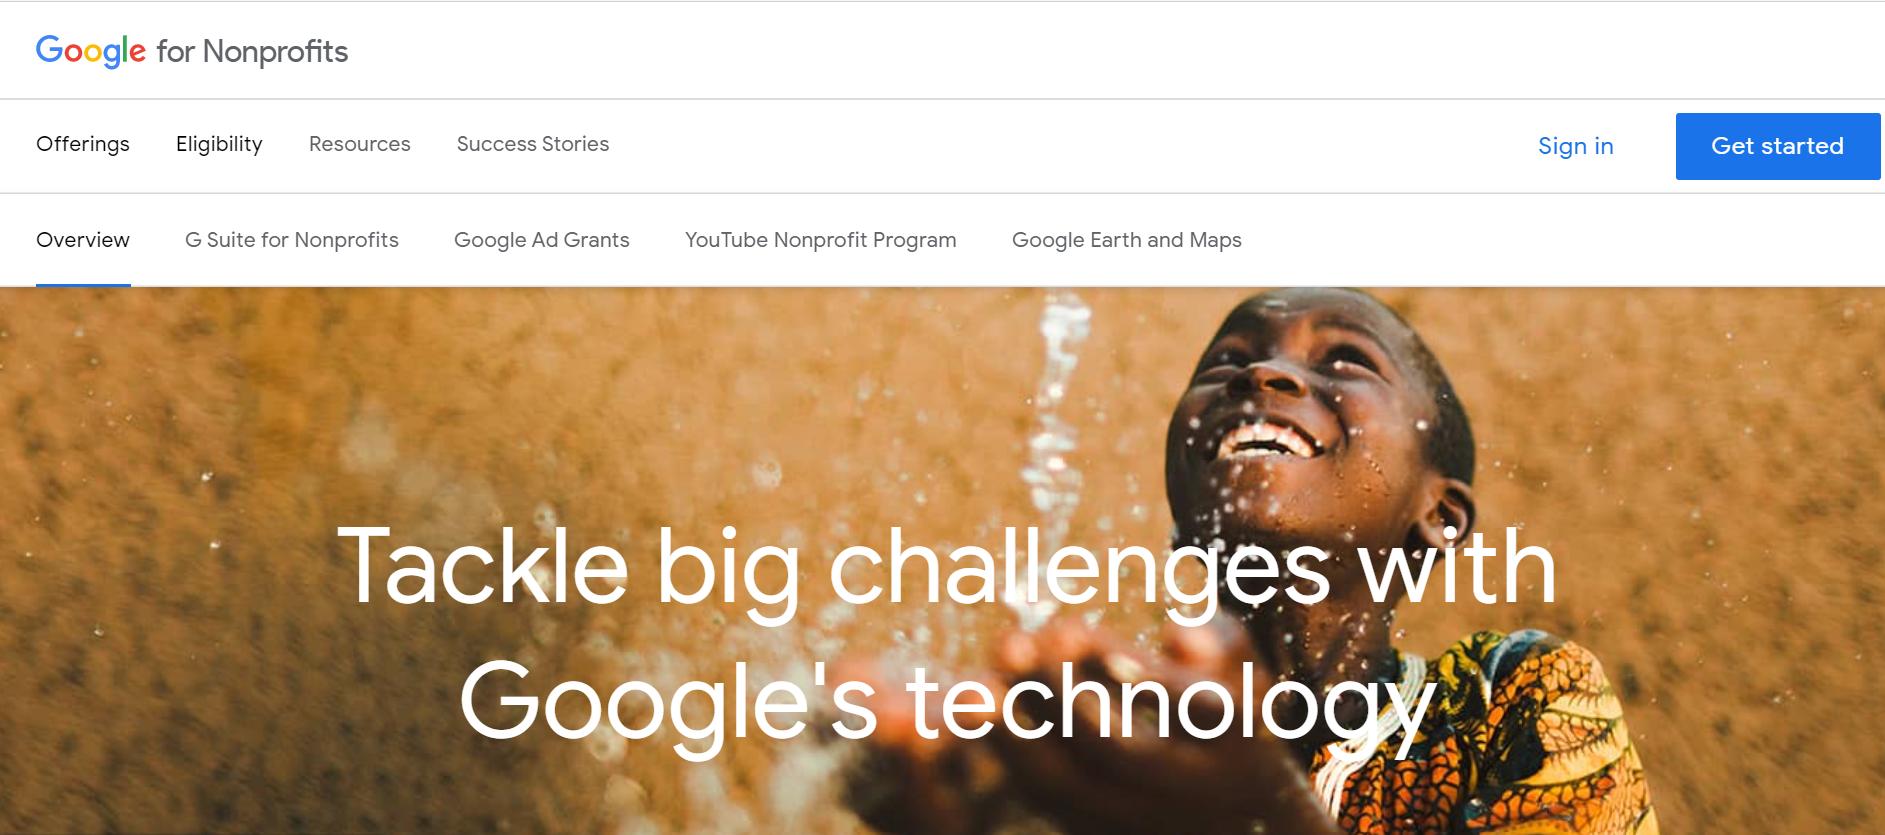 google-ad-grants-for-nonprofits-homepage